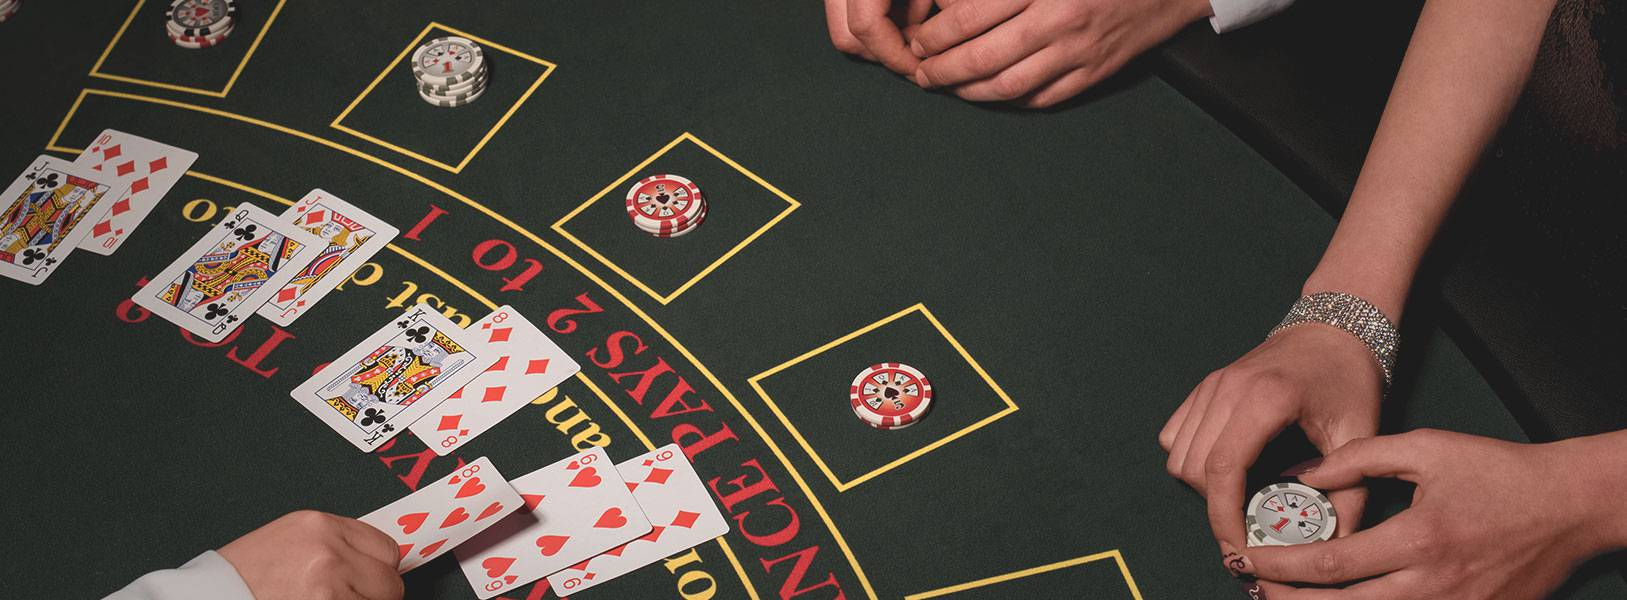 Bodog betting rules of blackjack bskyb sky betting